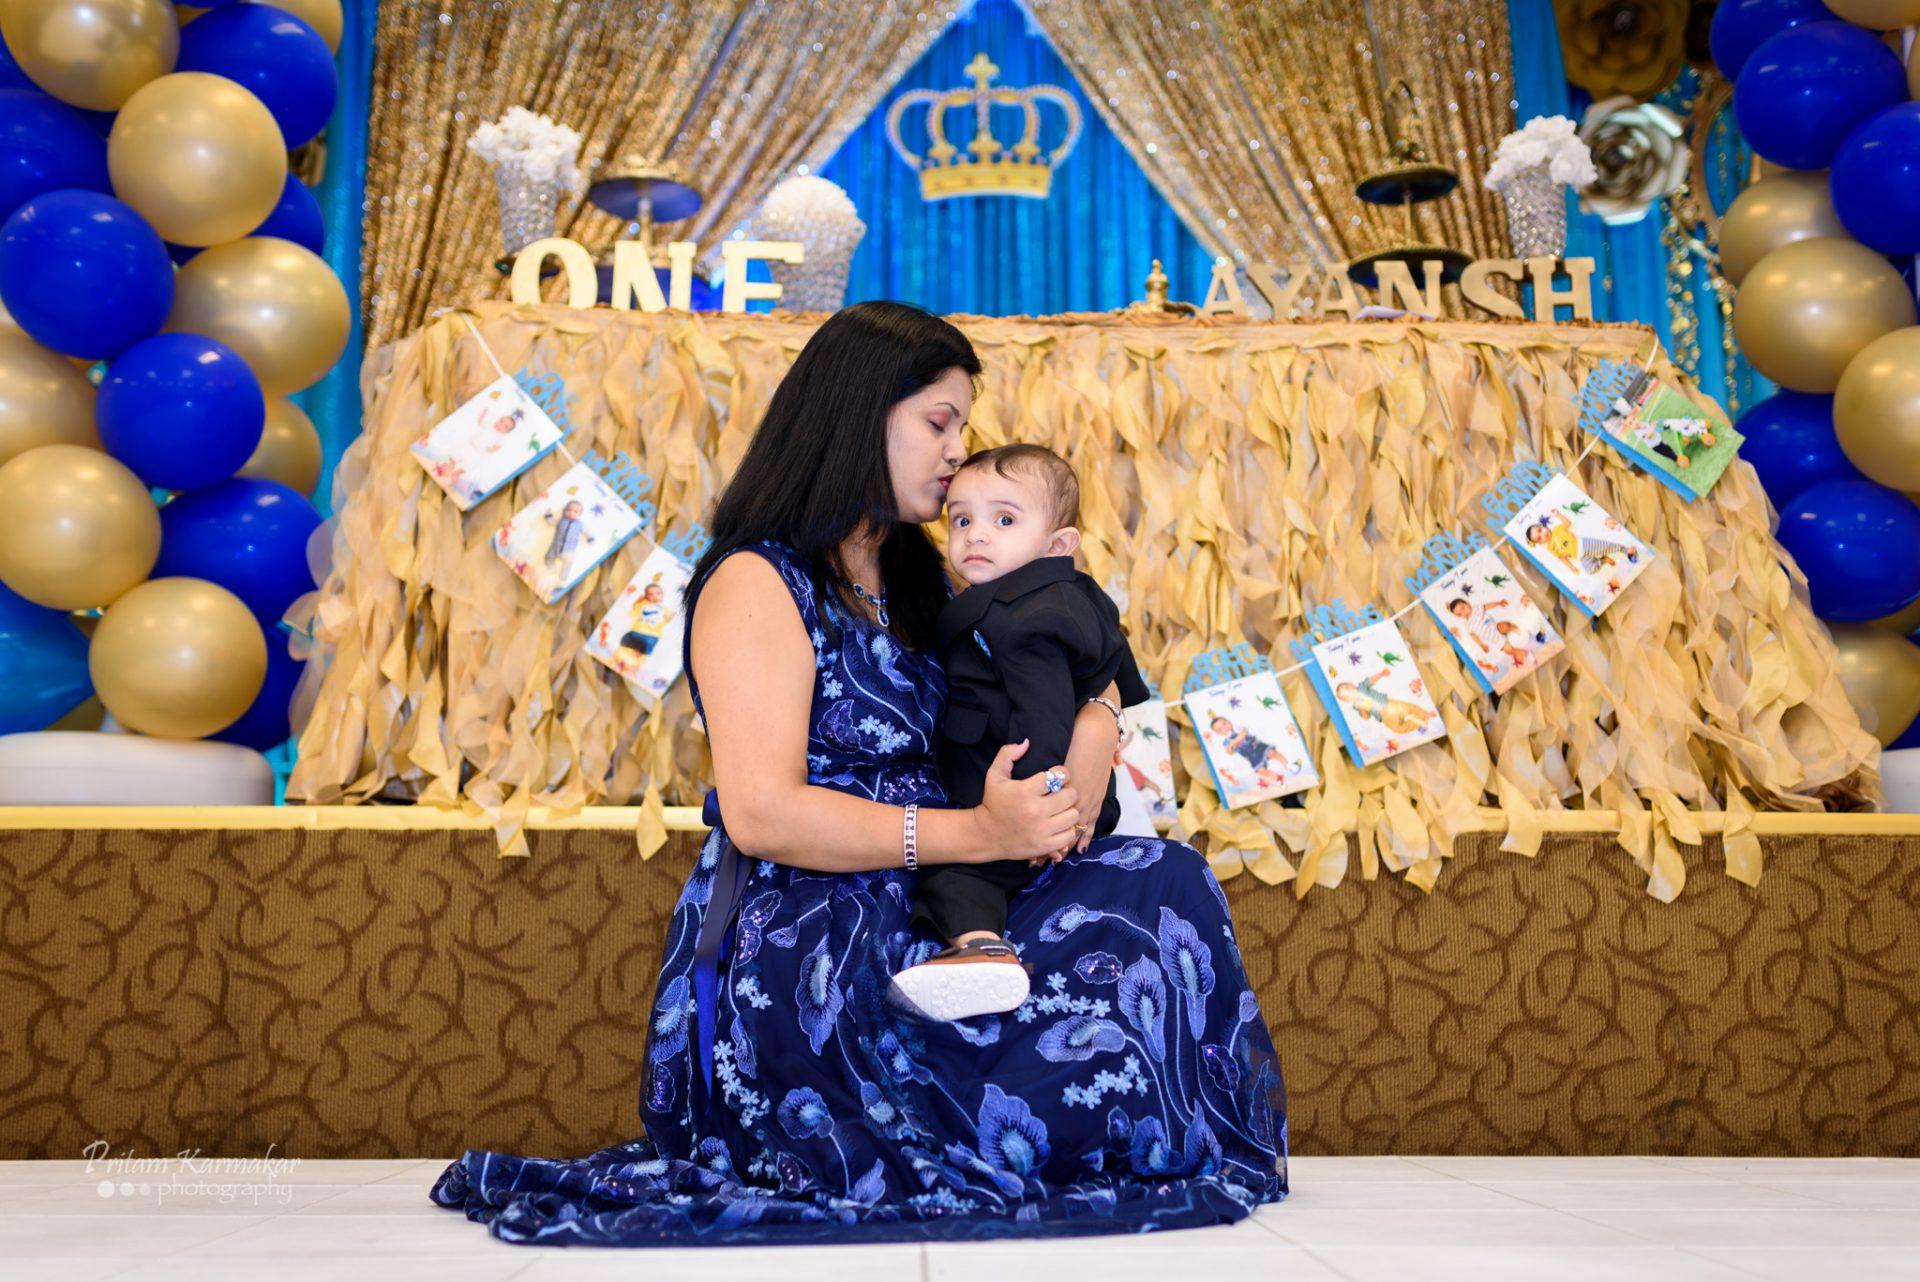 Ayansh's 1st Birthday